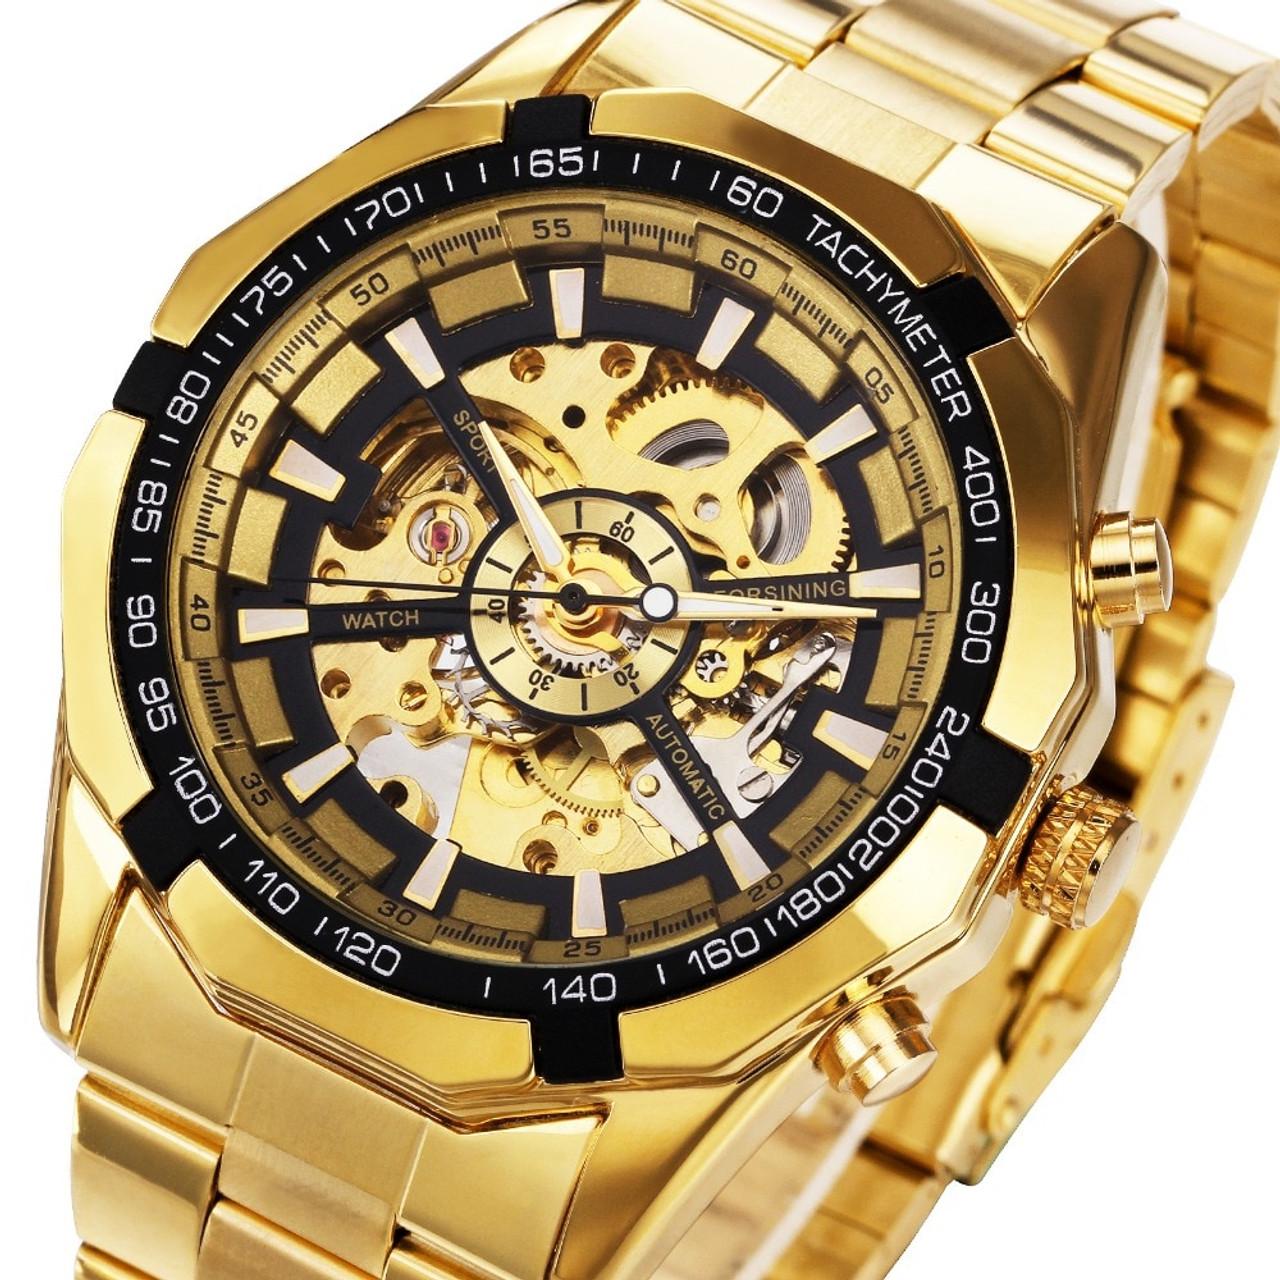 Winner Watch Men Skeleton Automatic Mechanical Watch Gold Skeleton Vintage Man  Watch Mens FORSINING Watch Top Brand Luxury - OnshopDeals.Com 4857764f151